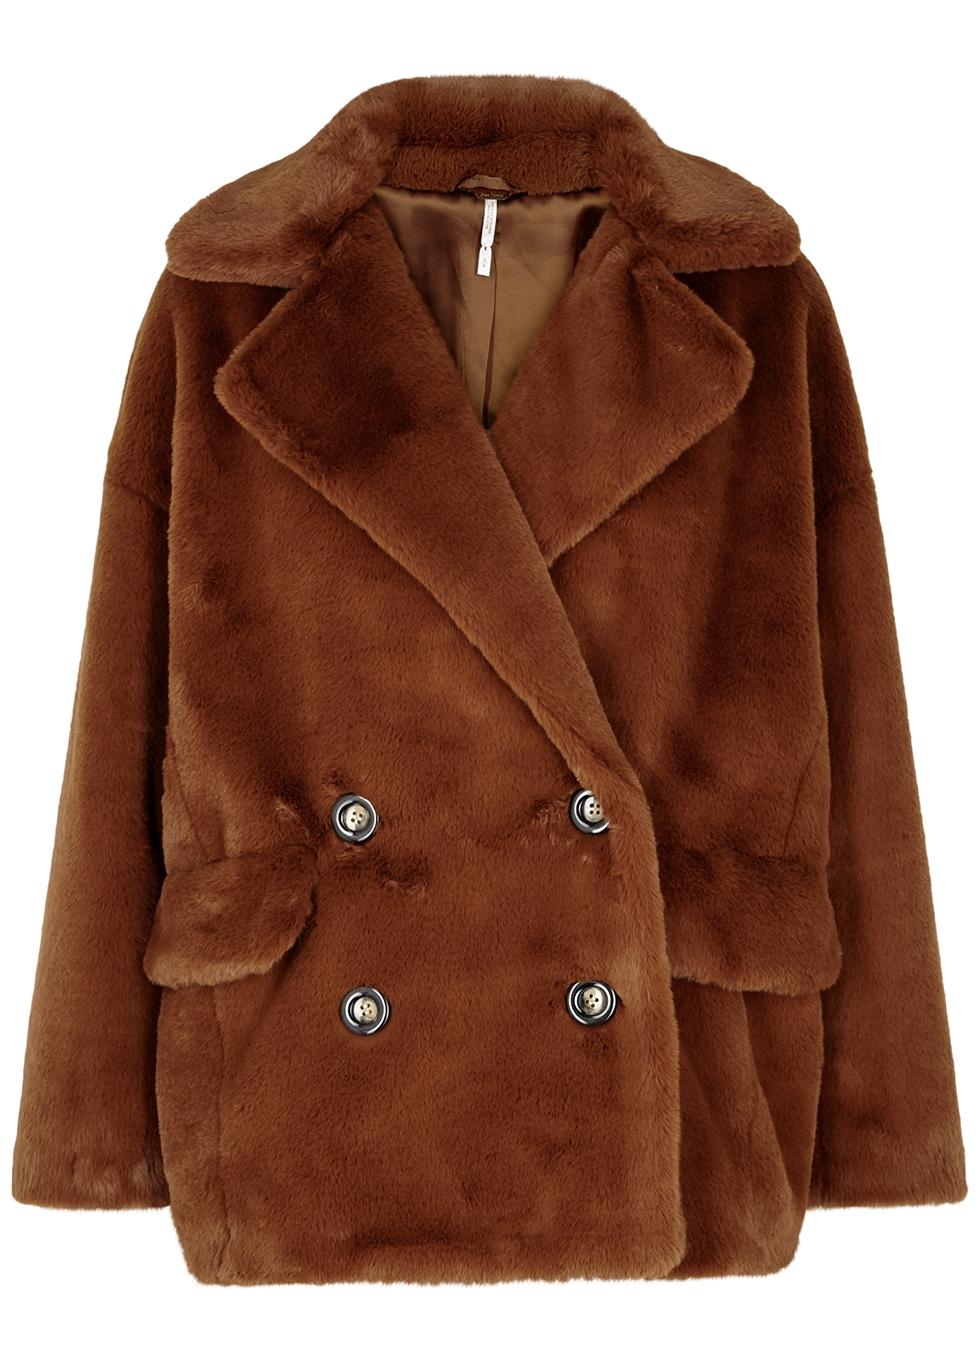 0ced69248bf3 Designer Coats - Women s Winter Coats - Harvey Nichols